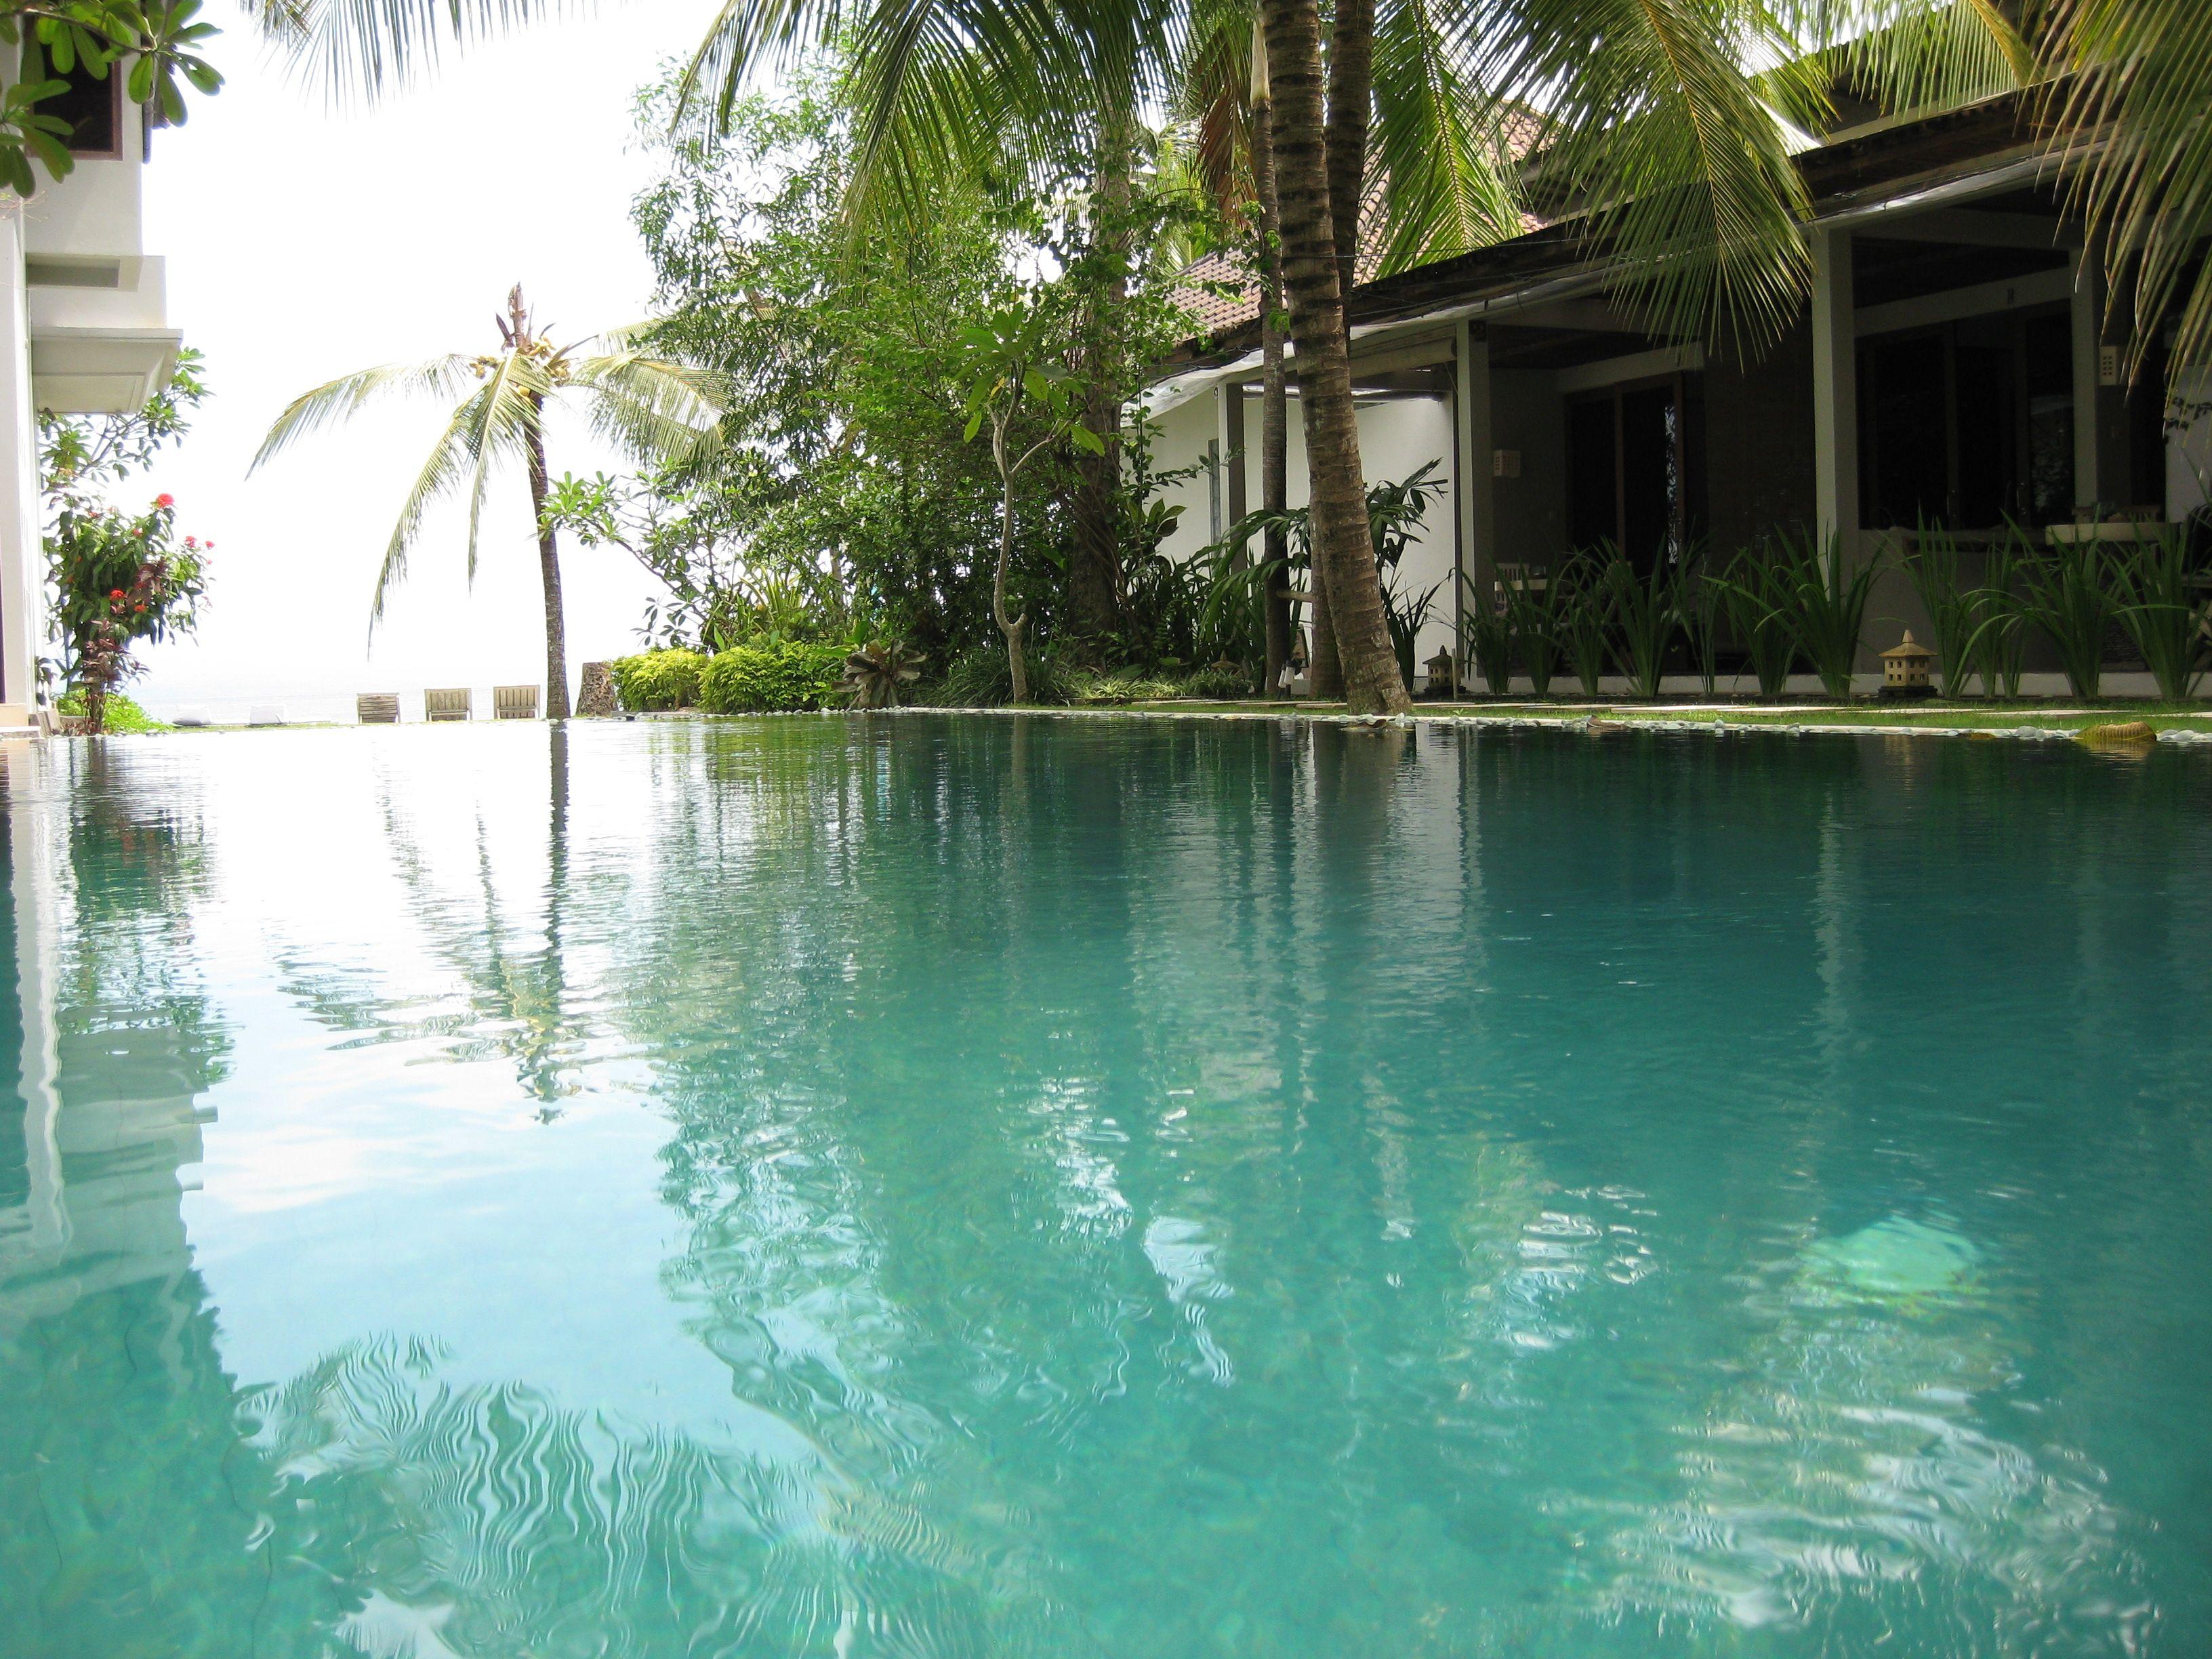 Aquaria Resort Candidasa - Bali Travel Journey